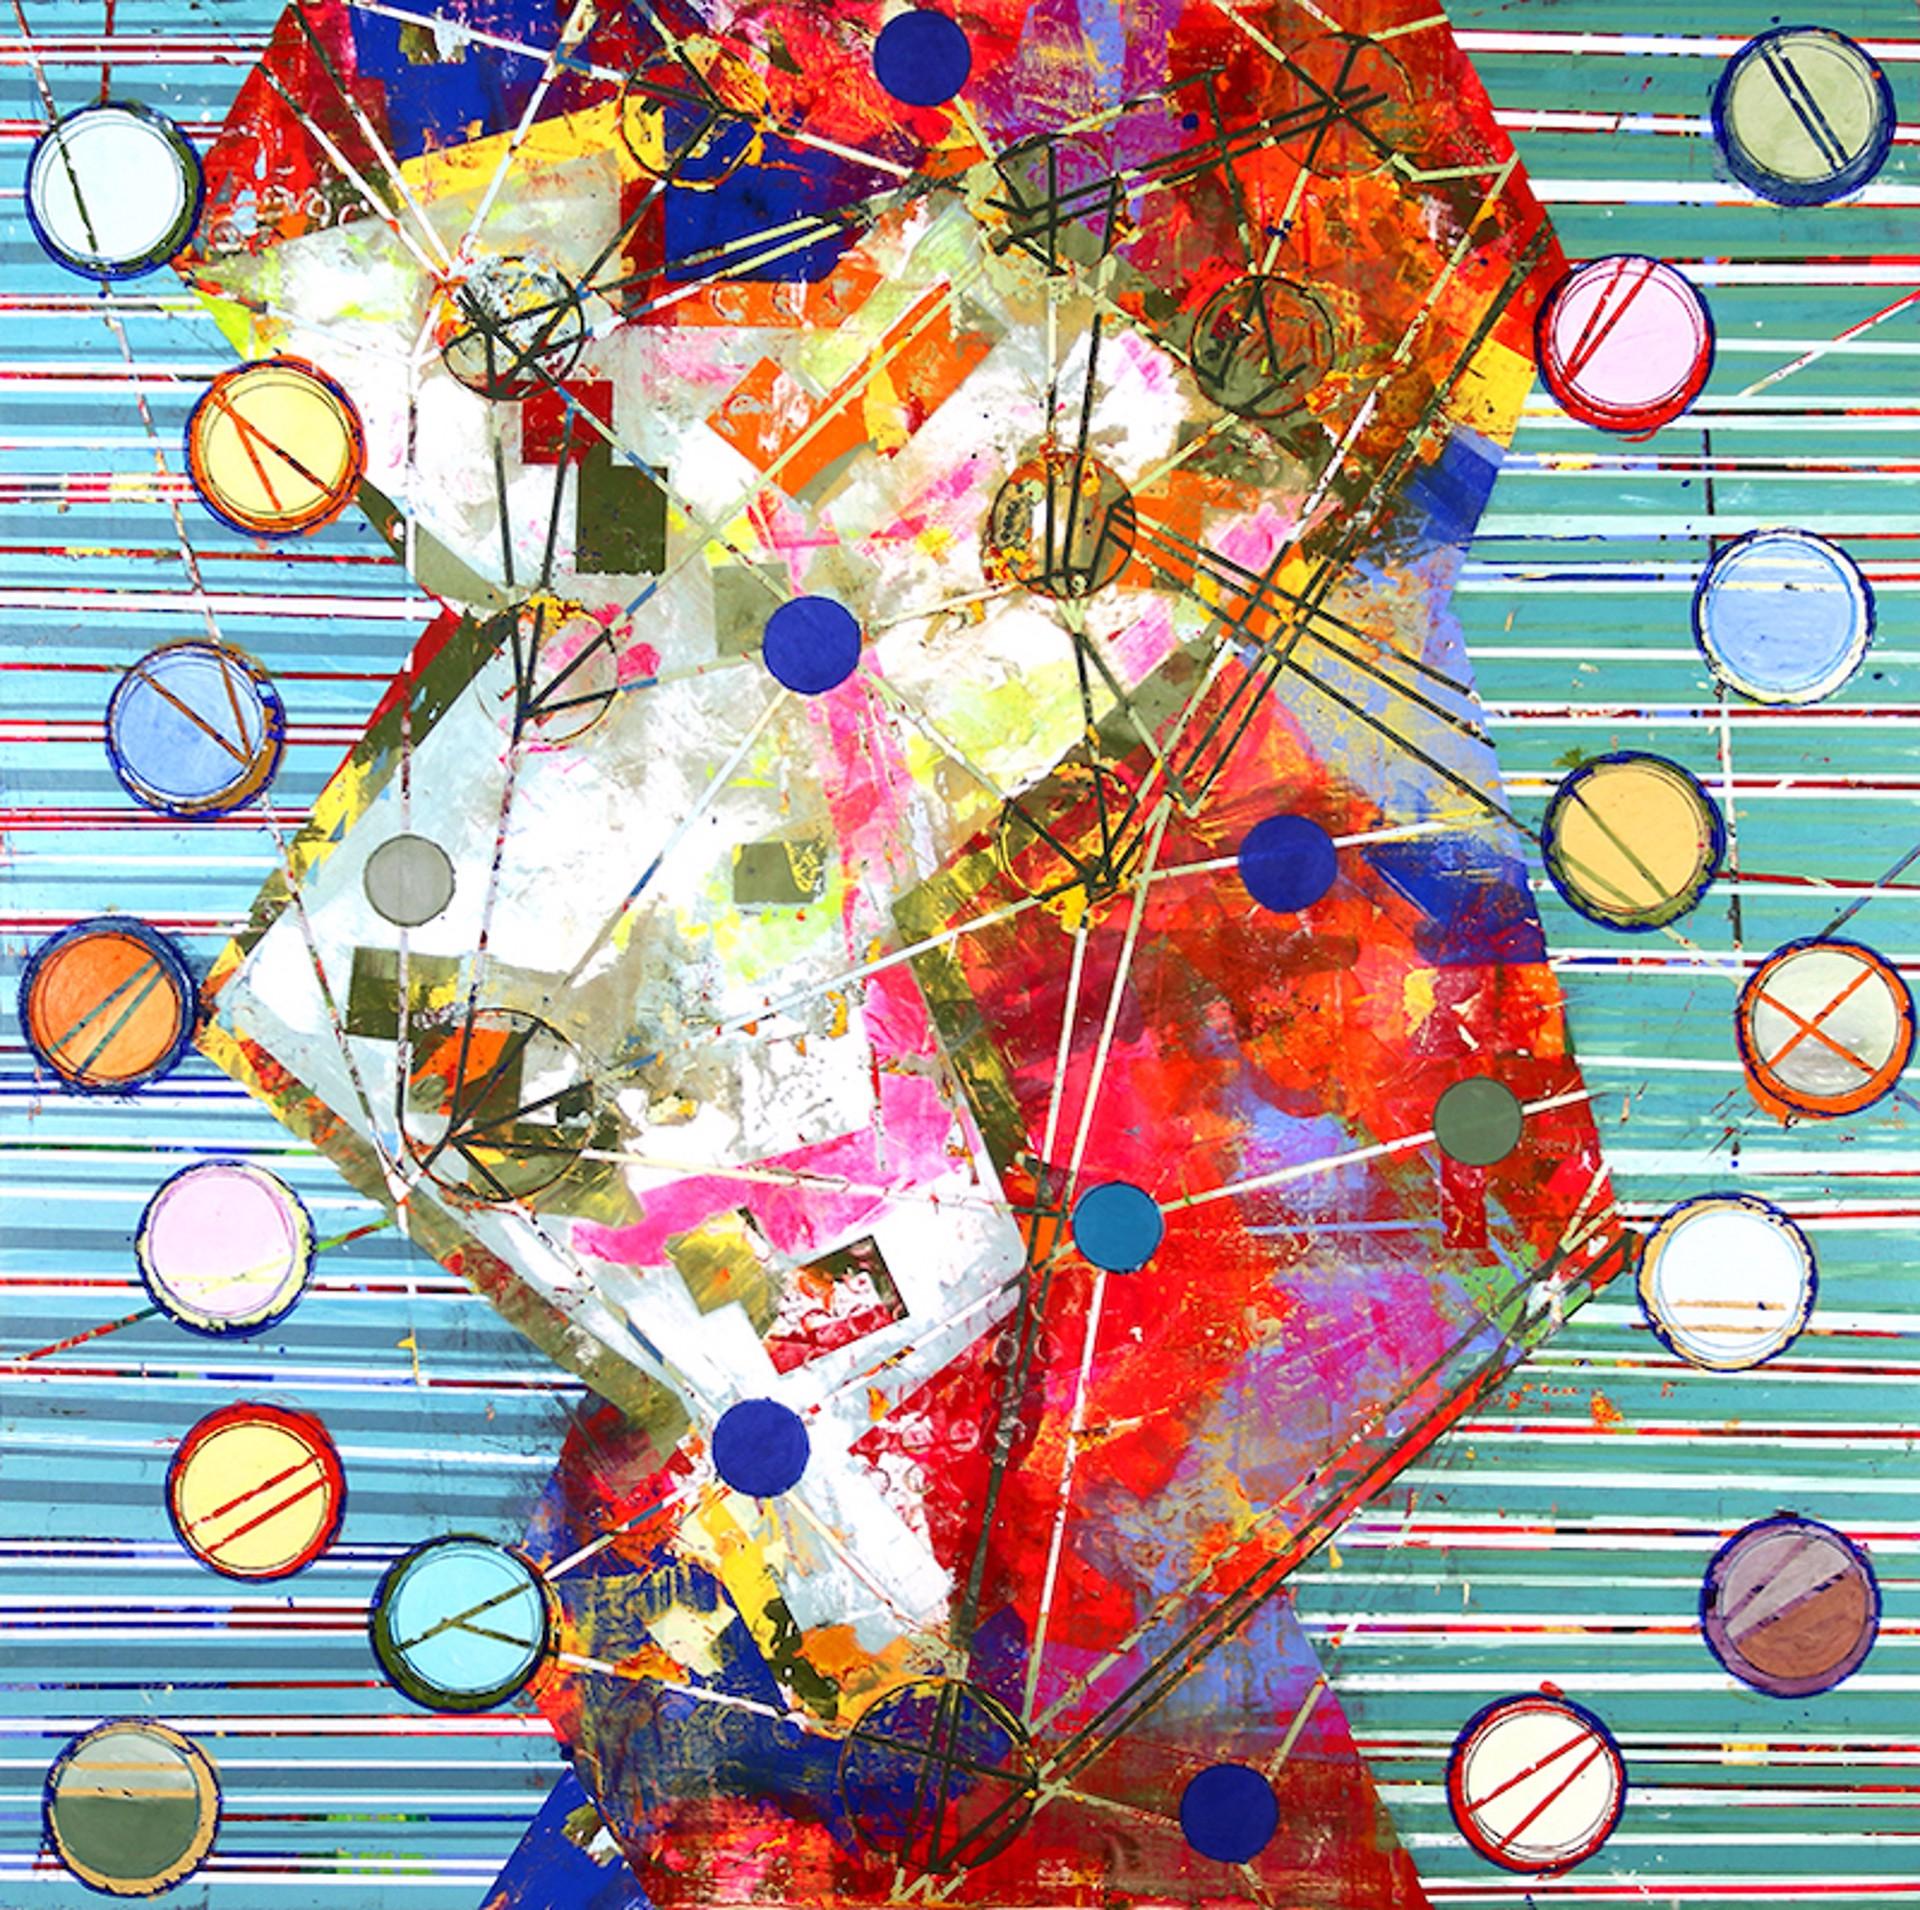 Fibonacci 434 by Jylian Gustlin